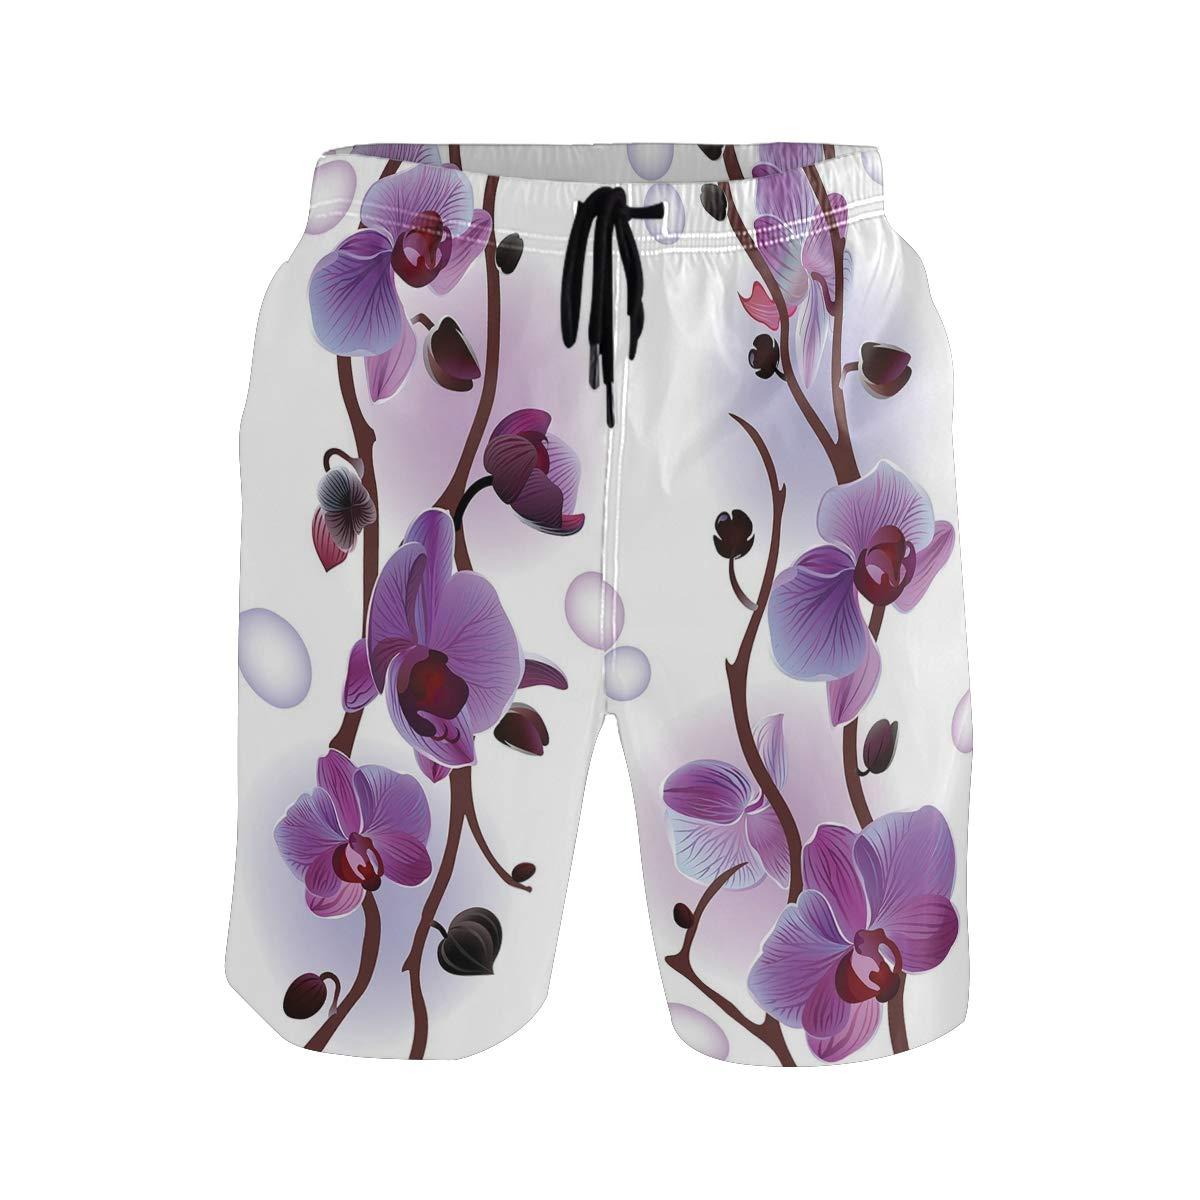 KVMV Gardening Themed Pattern with Little Tender Primrose Primula Blos 5size Beach Shorts